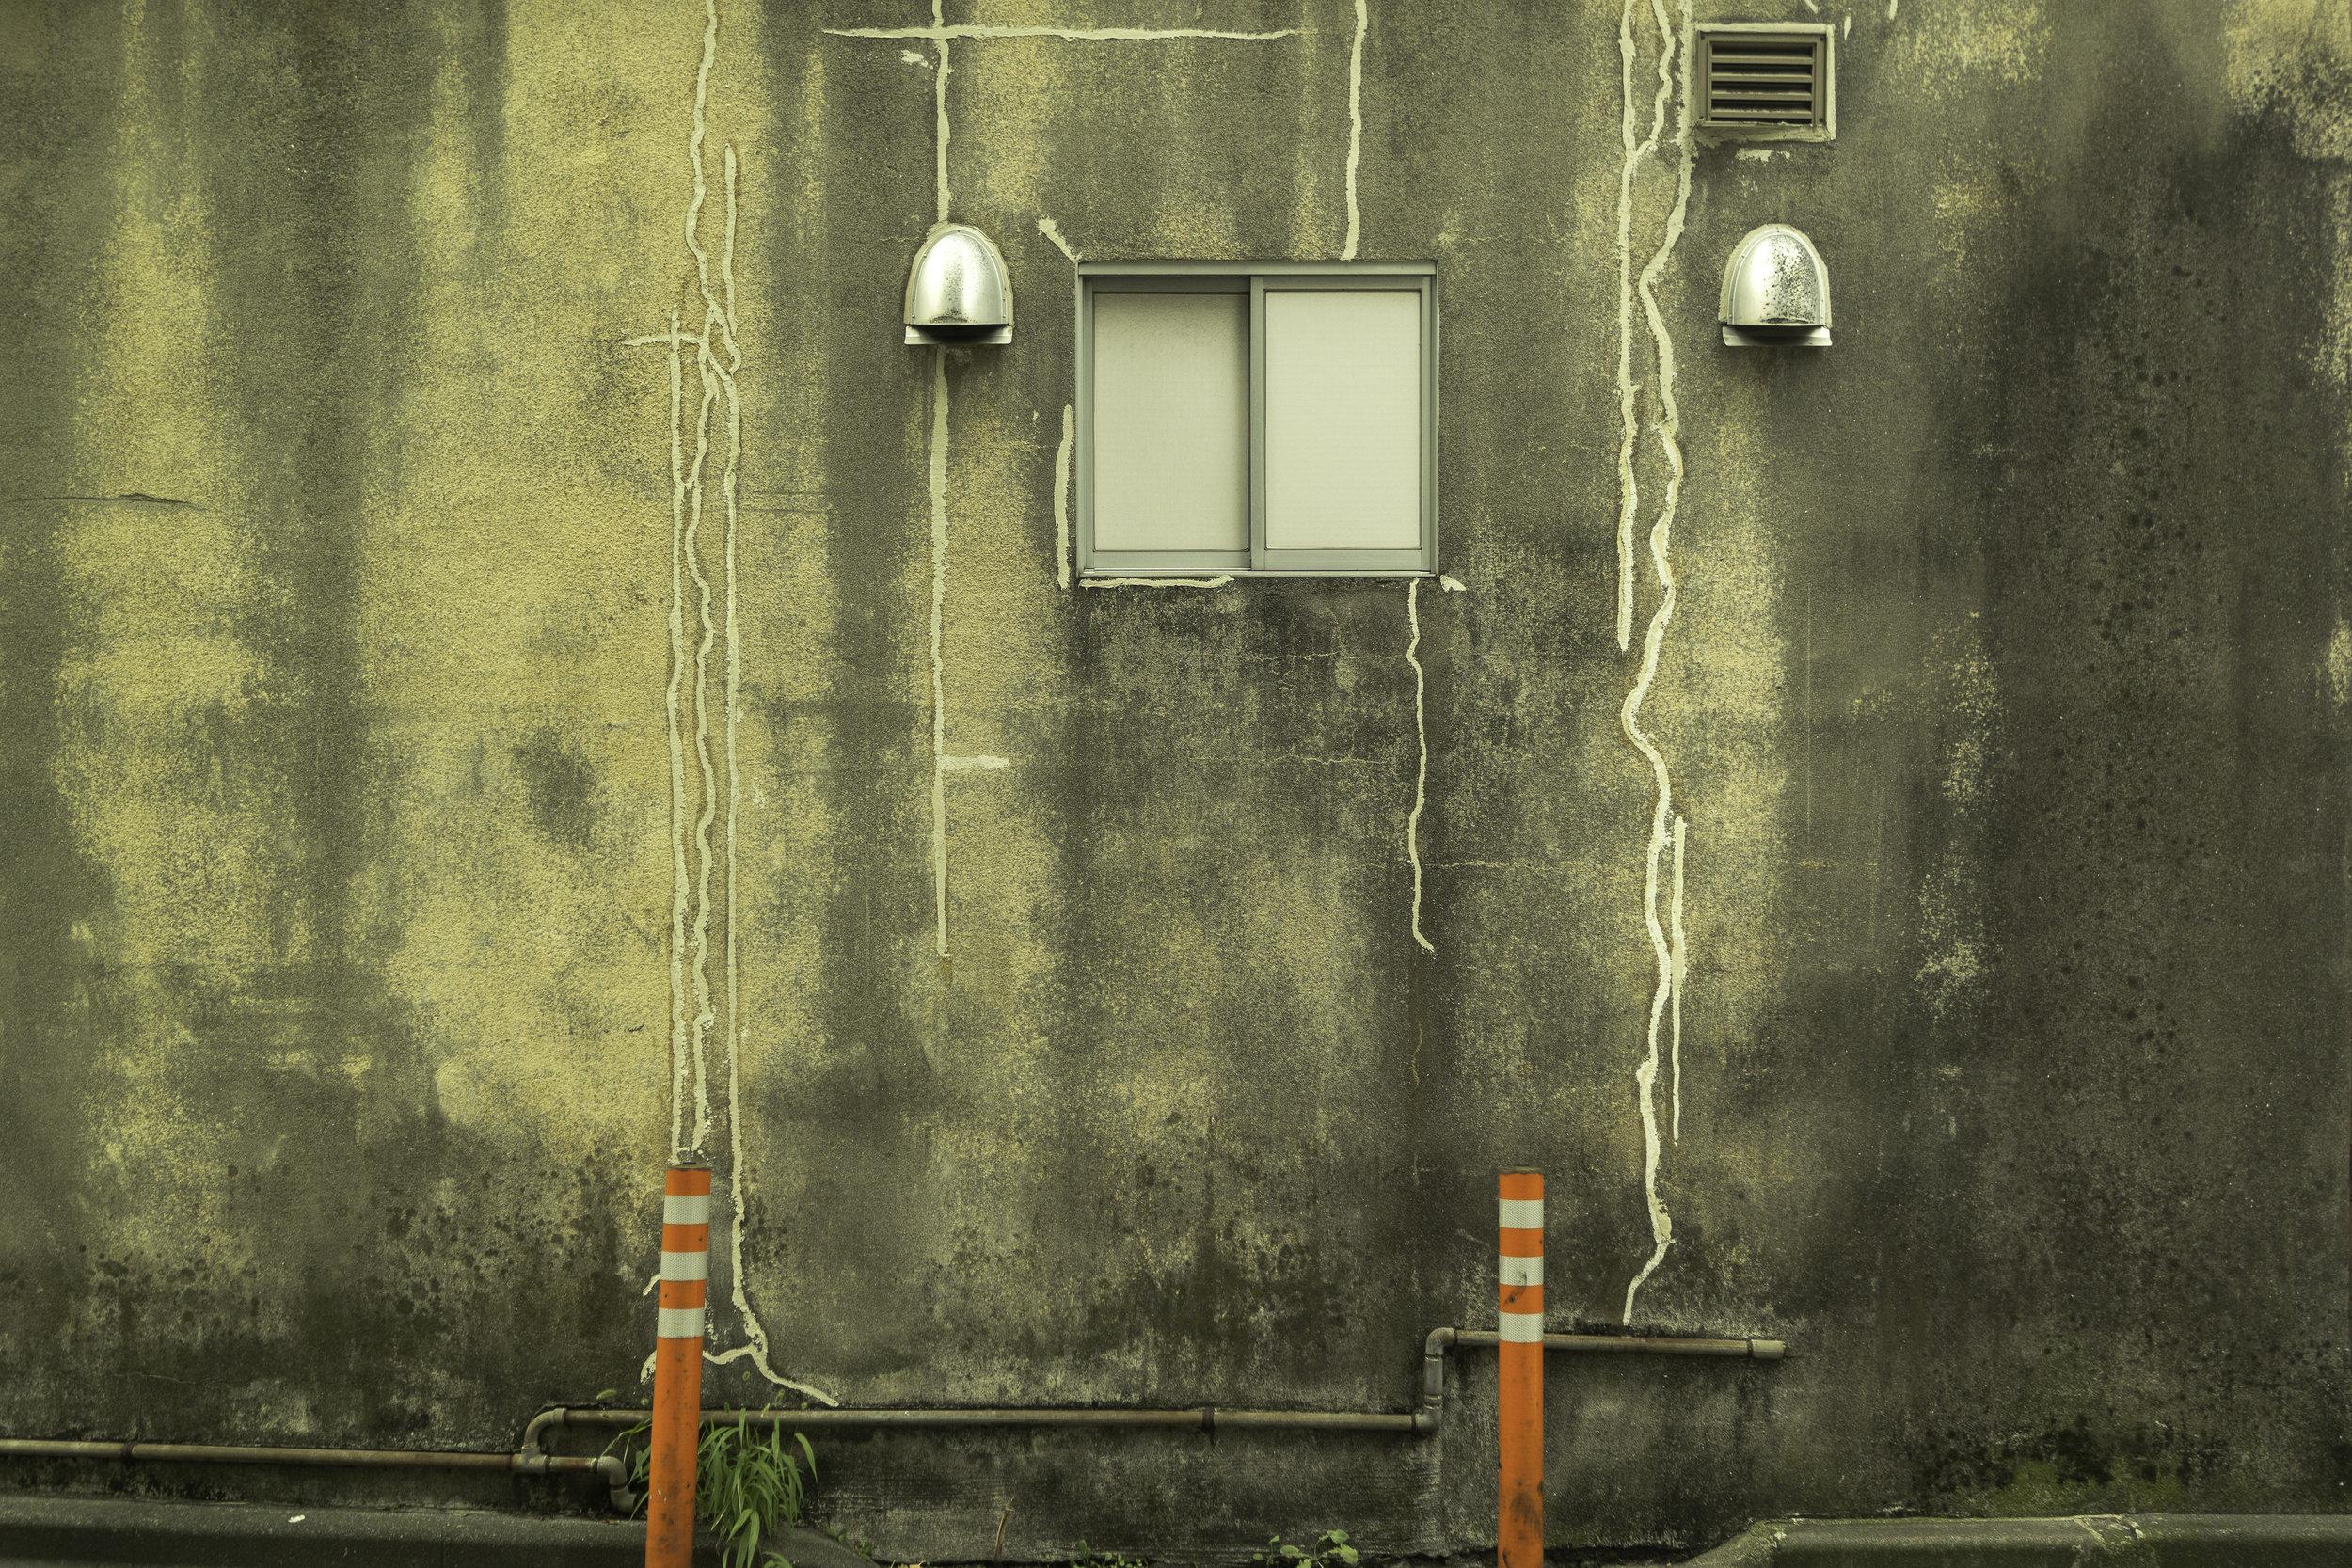 A-face-on-the-wall-Tokyo-Japan.jpg